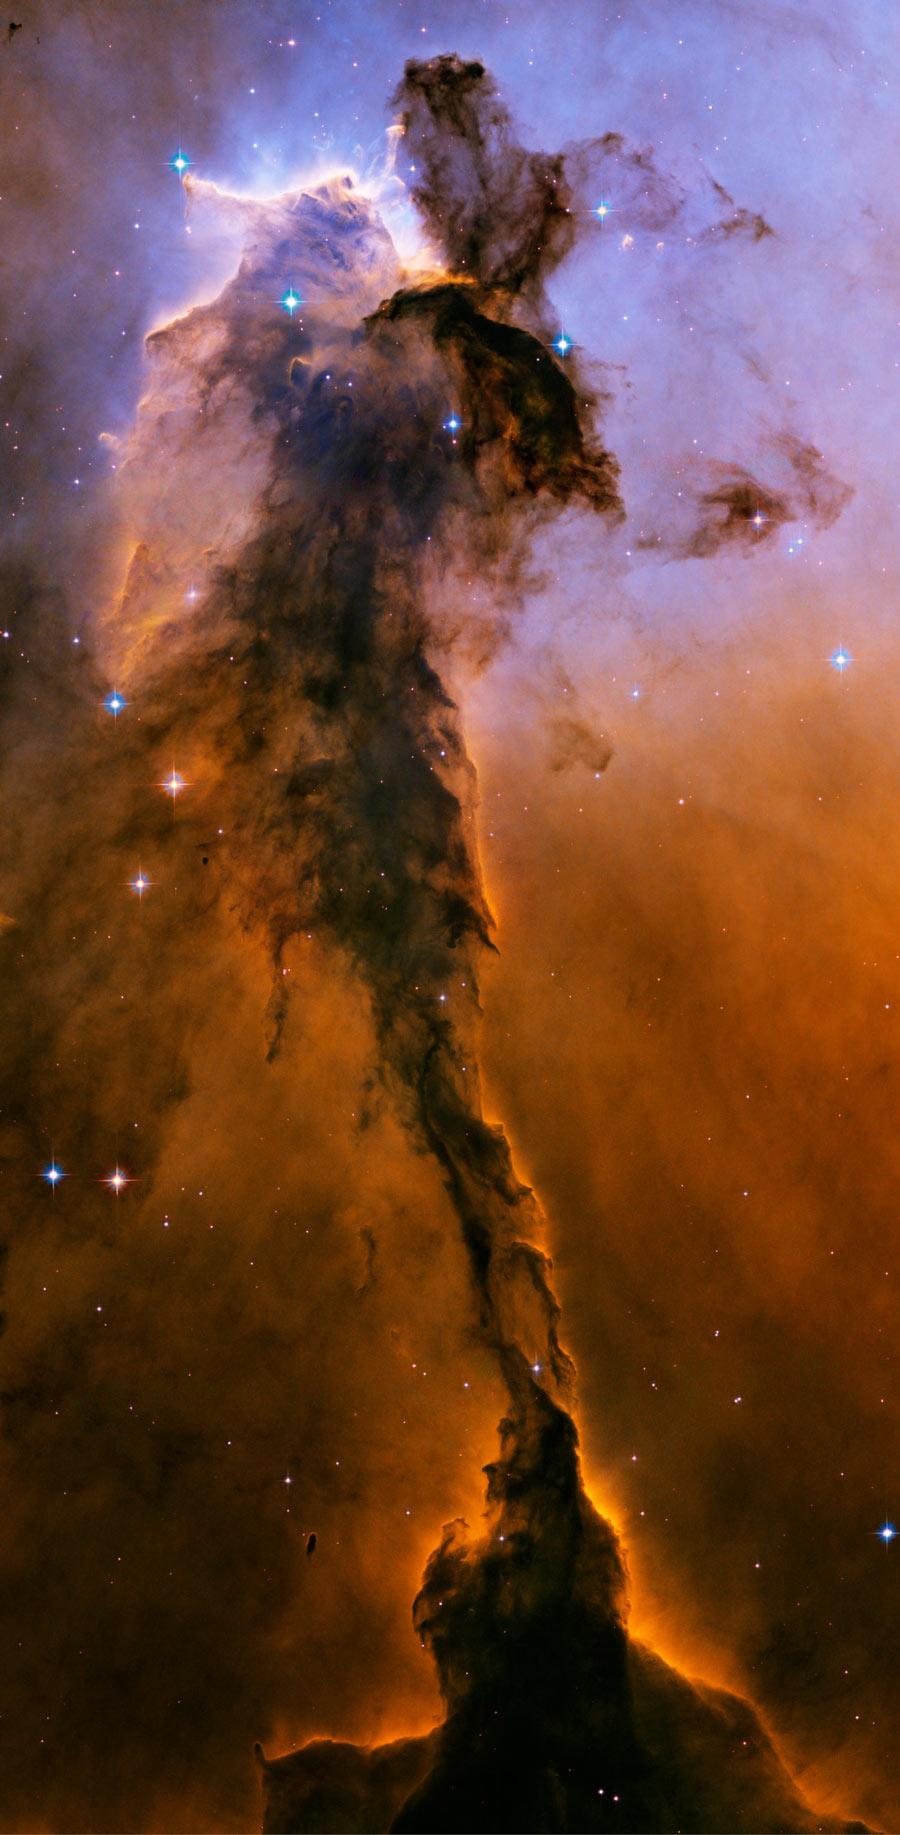 El hada de la nebulosa del Águila